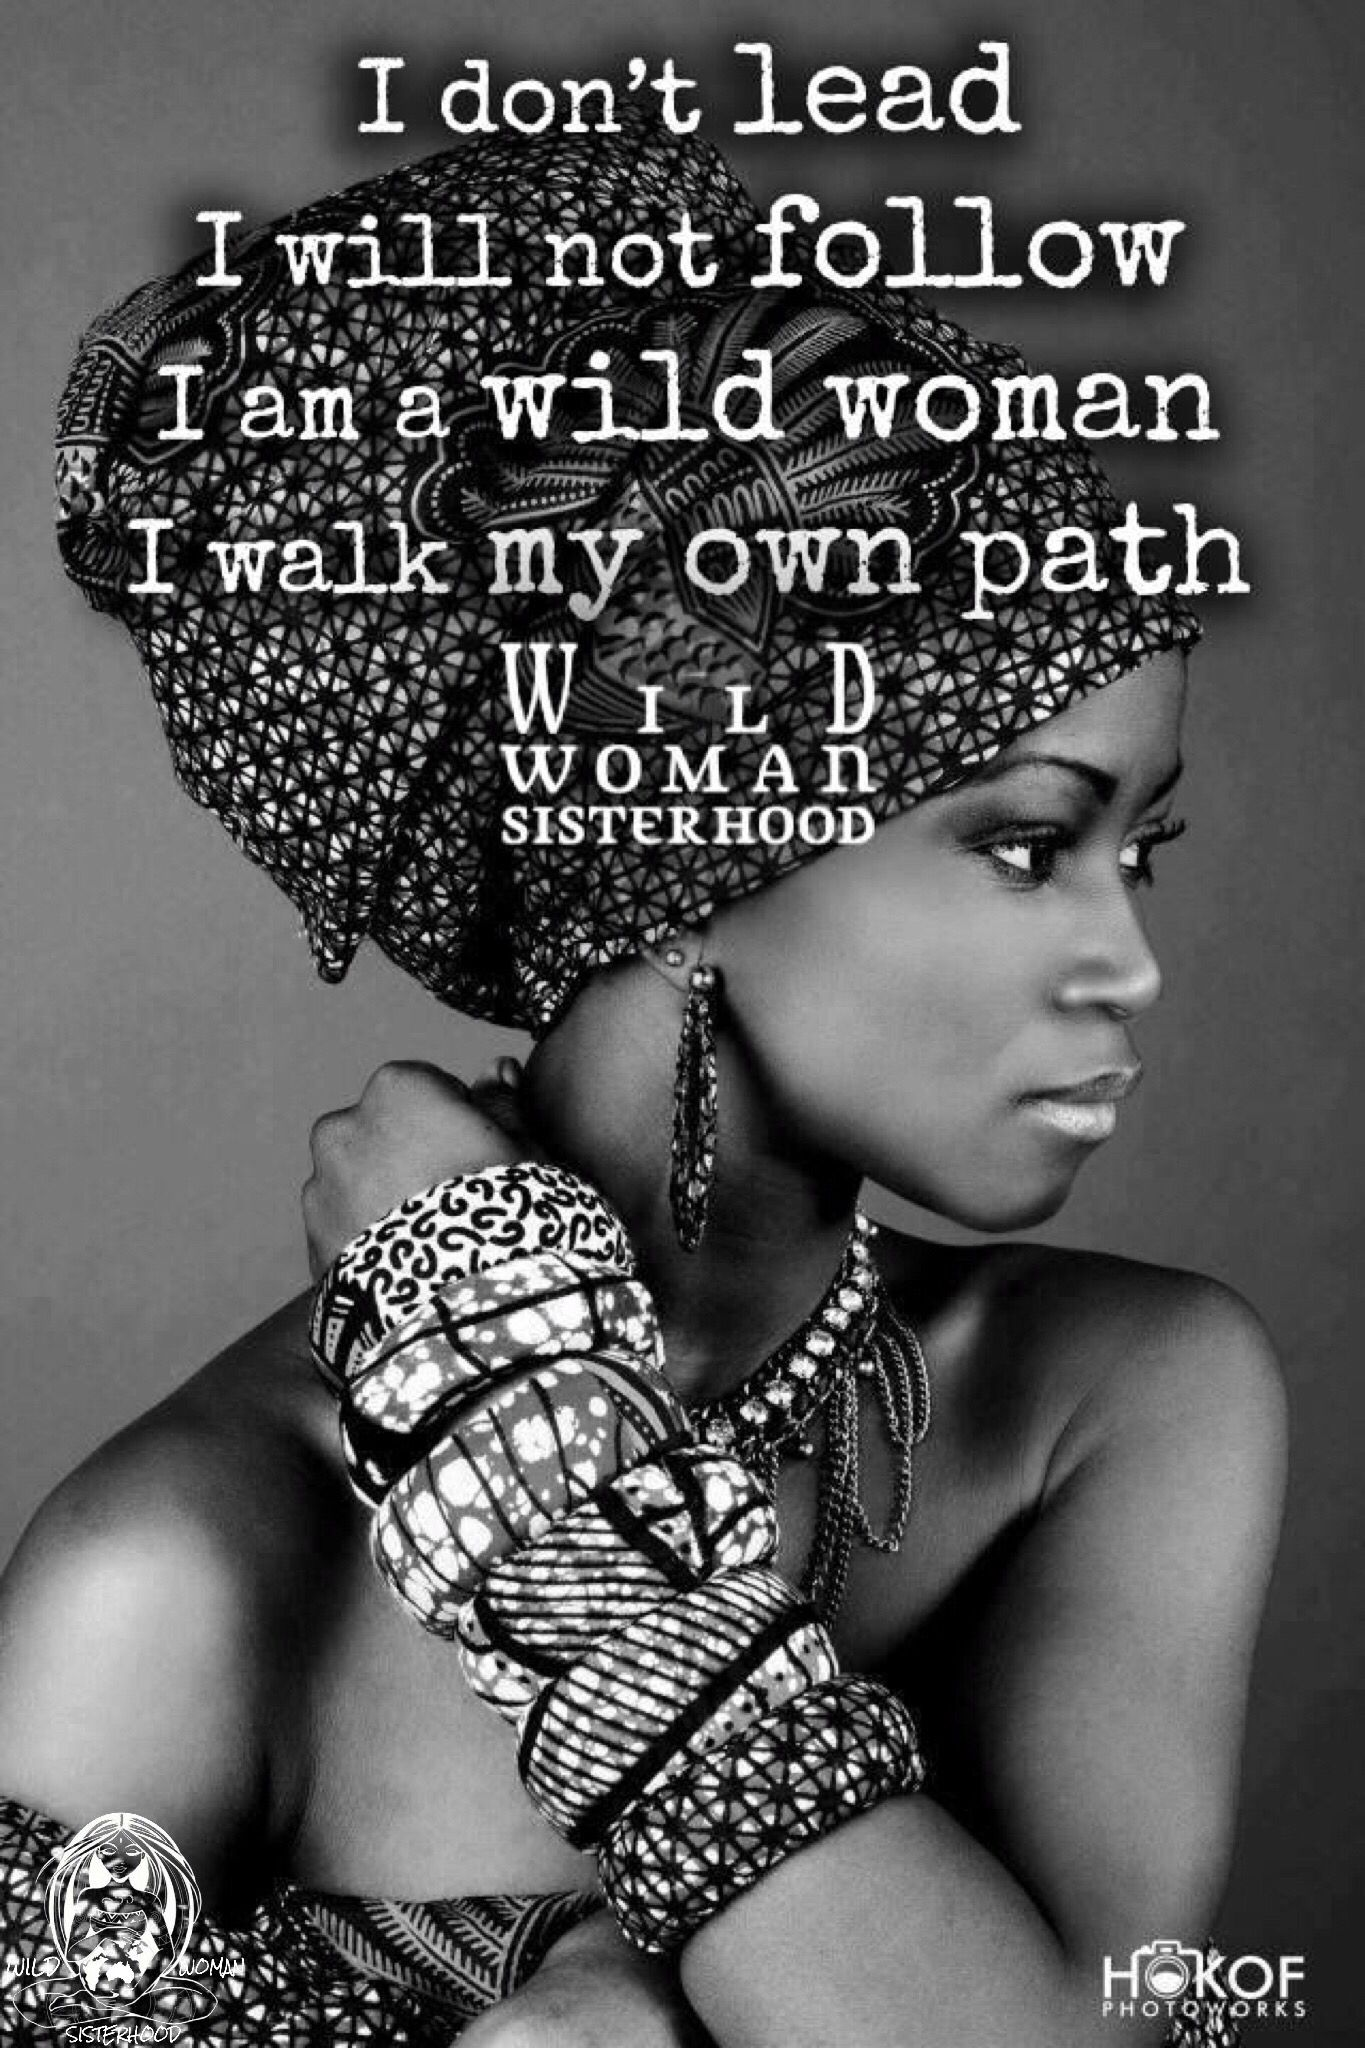 I follow the path of my ancestors. Therefore I do not lead like others religions lead. I do not follow like other religions follow. Every step is taken after careful meditation...I walk my own path... WILD WOMAN SISTERHOOD™ #wildwomen #touchtheearth #earthenspirit #wildwomen #nature #earth #wildwomansisterhood #wildwomanmedicine #touchingtheearth #mothernature #sacredmedicinewoman #sacredduty